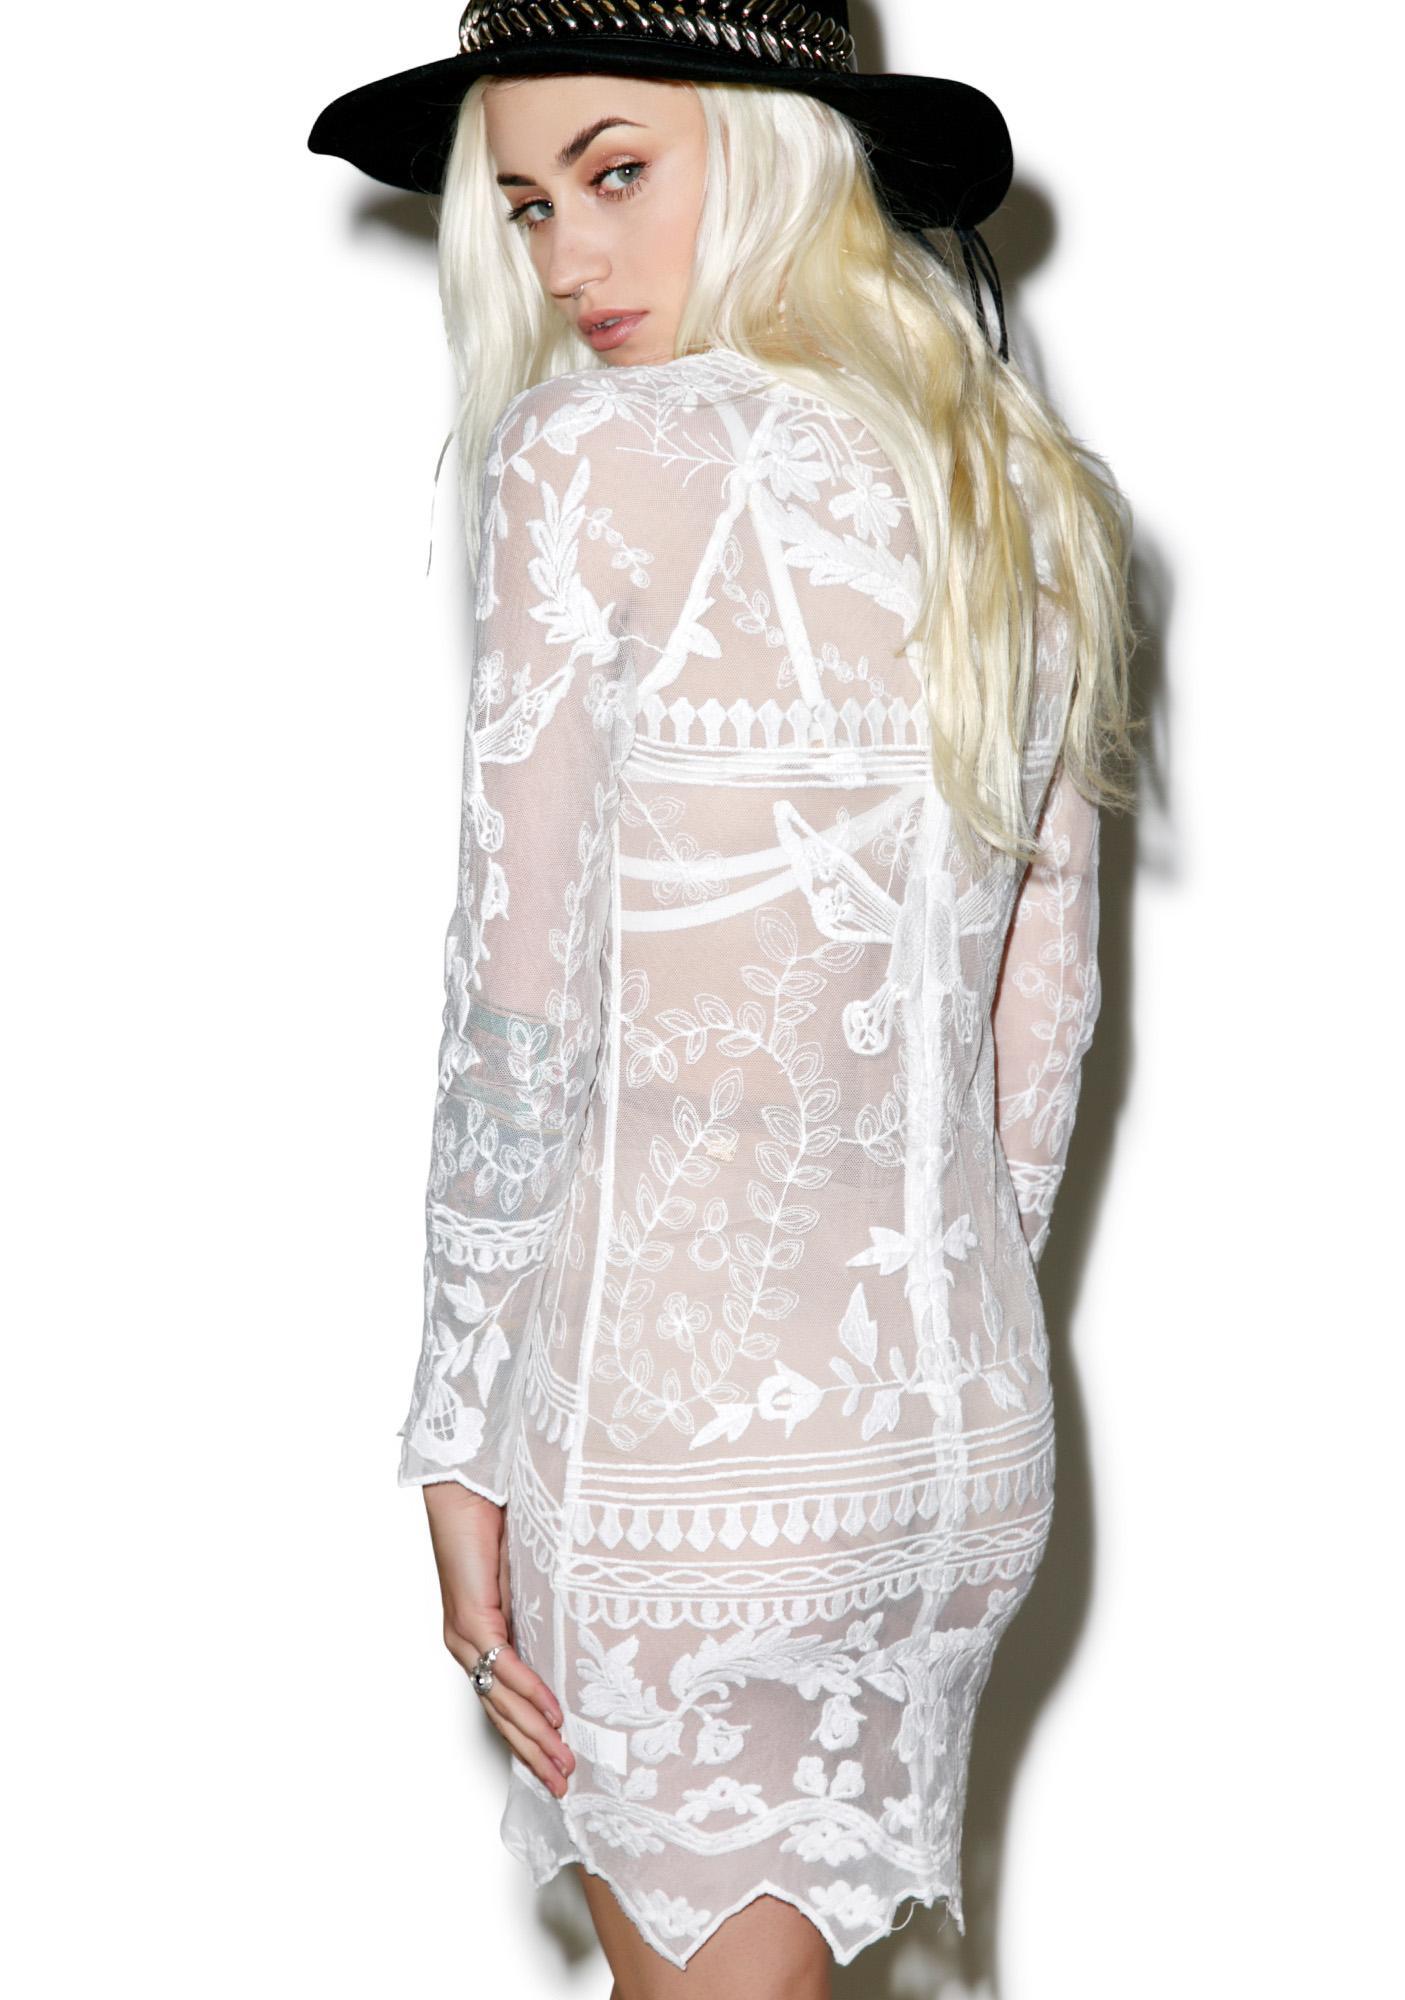 Clementine Lace Dress